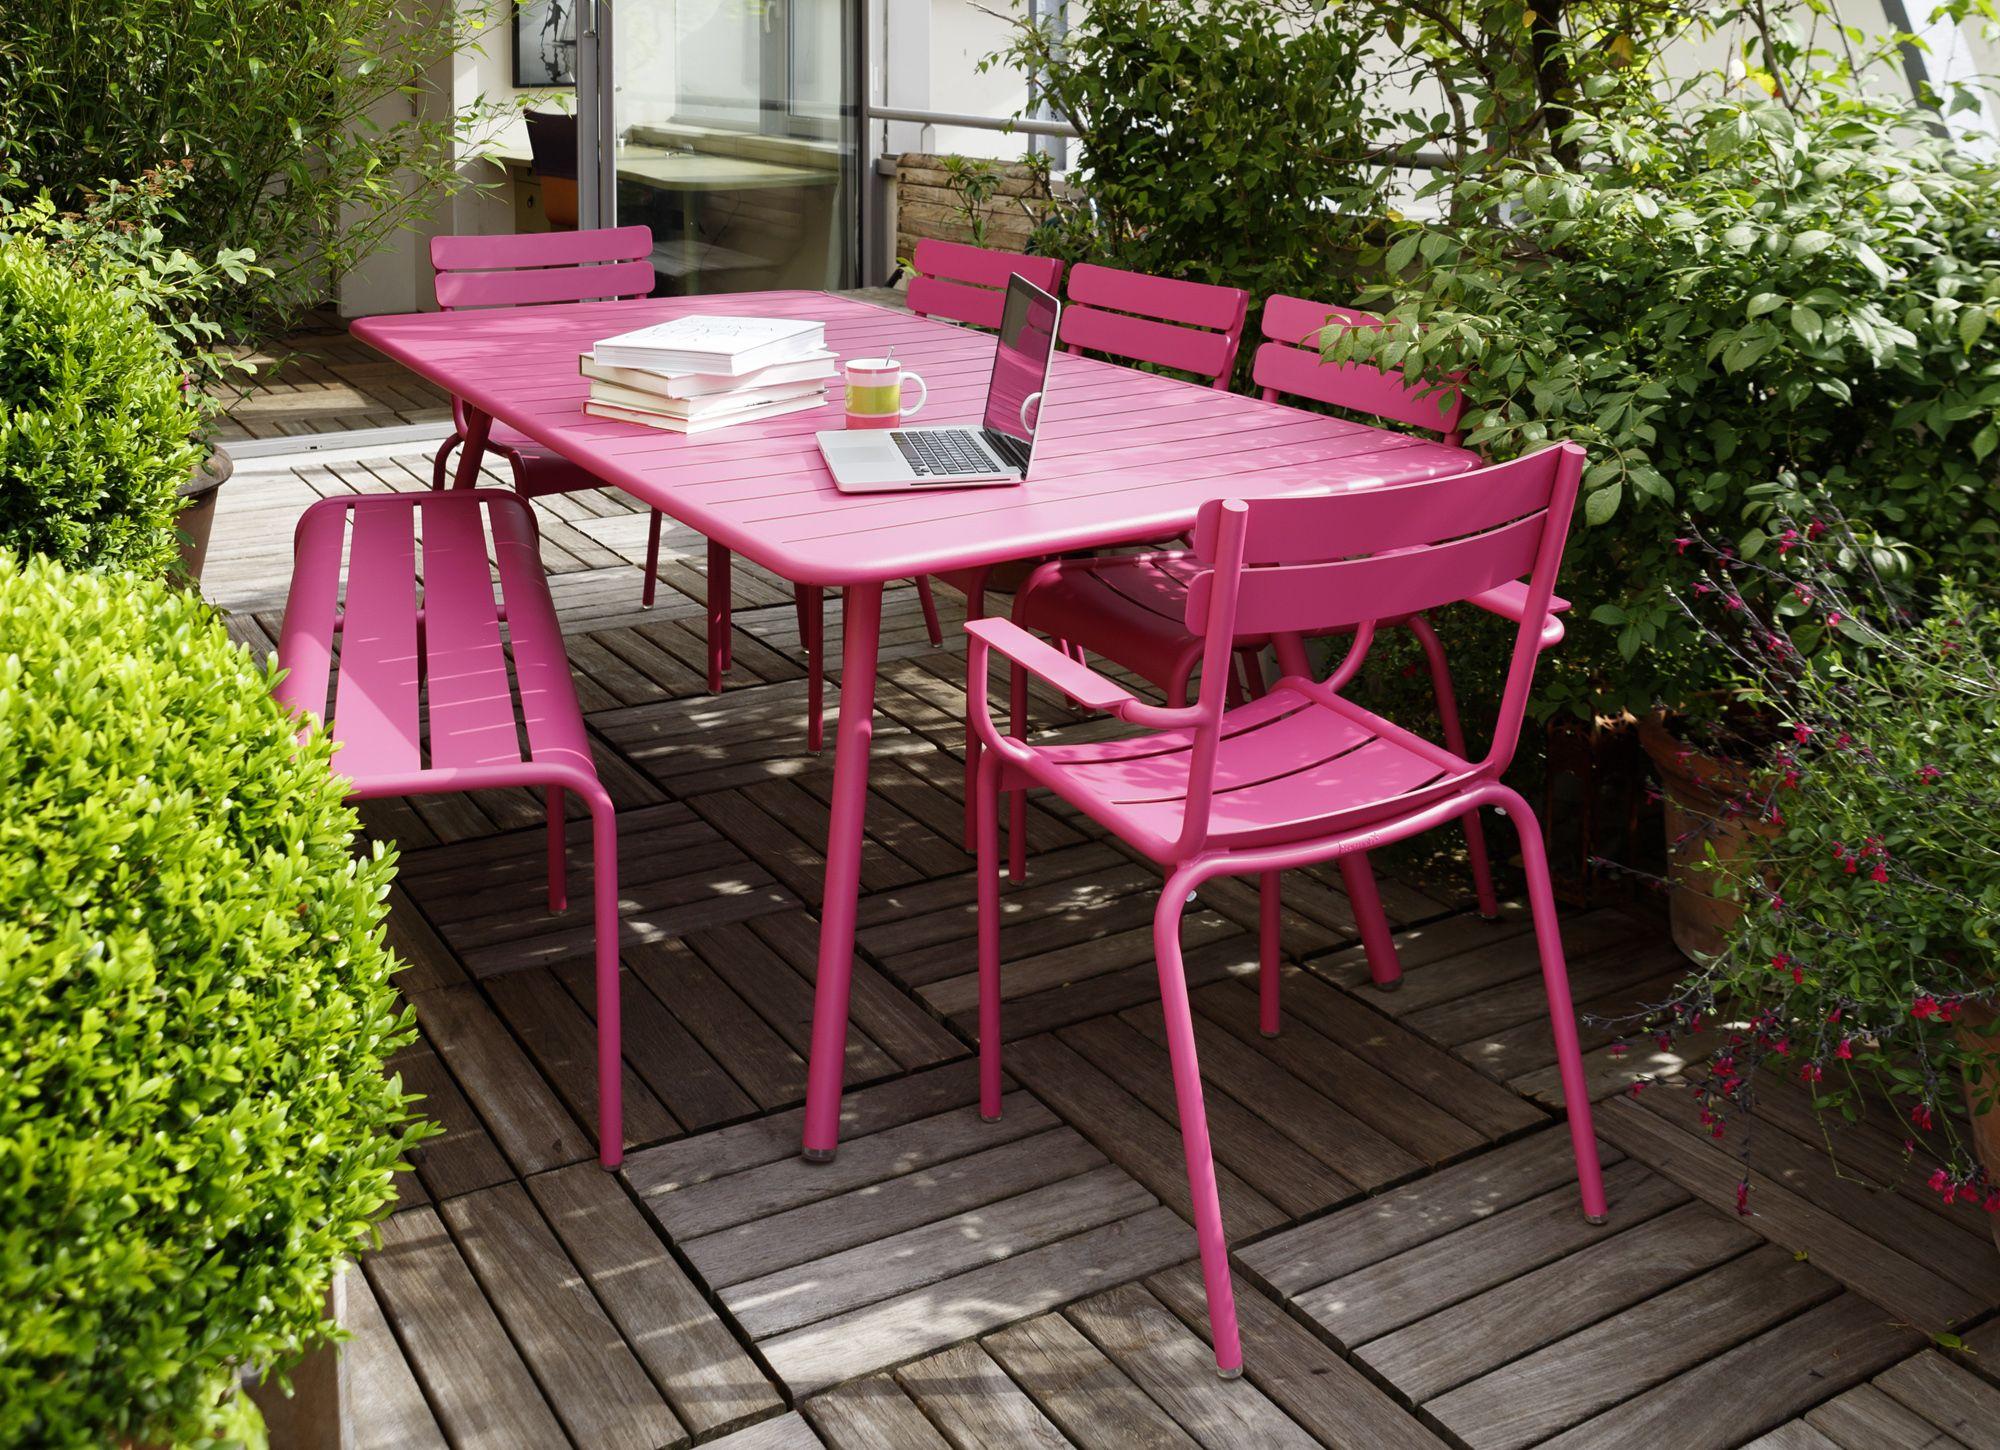 Ensemble De Jardin Luxembourg Rose Fuchsia - Fermob ... encequiconcerne Table Jardin Rose